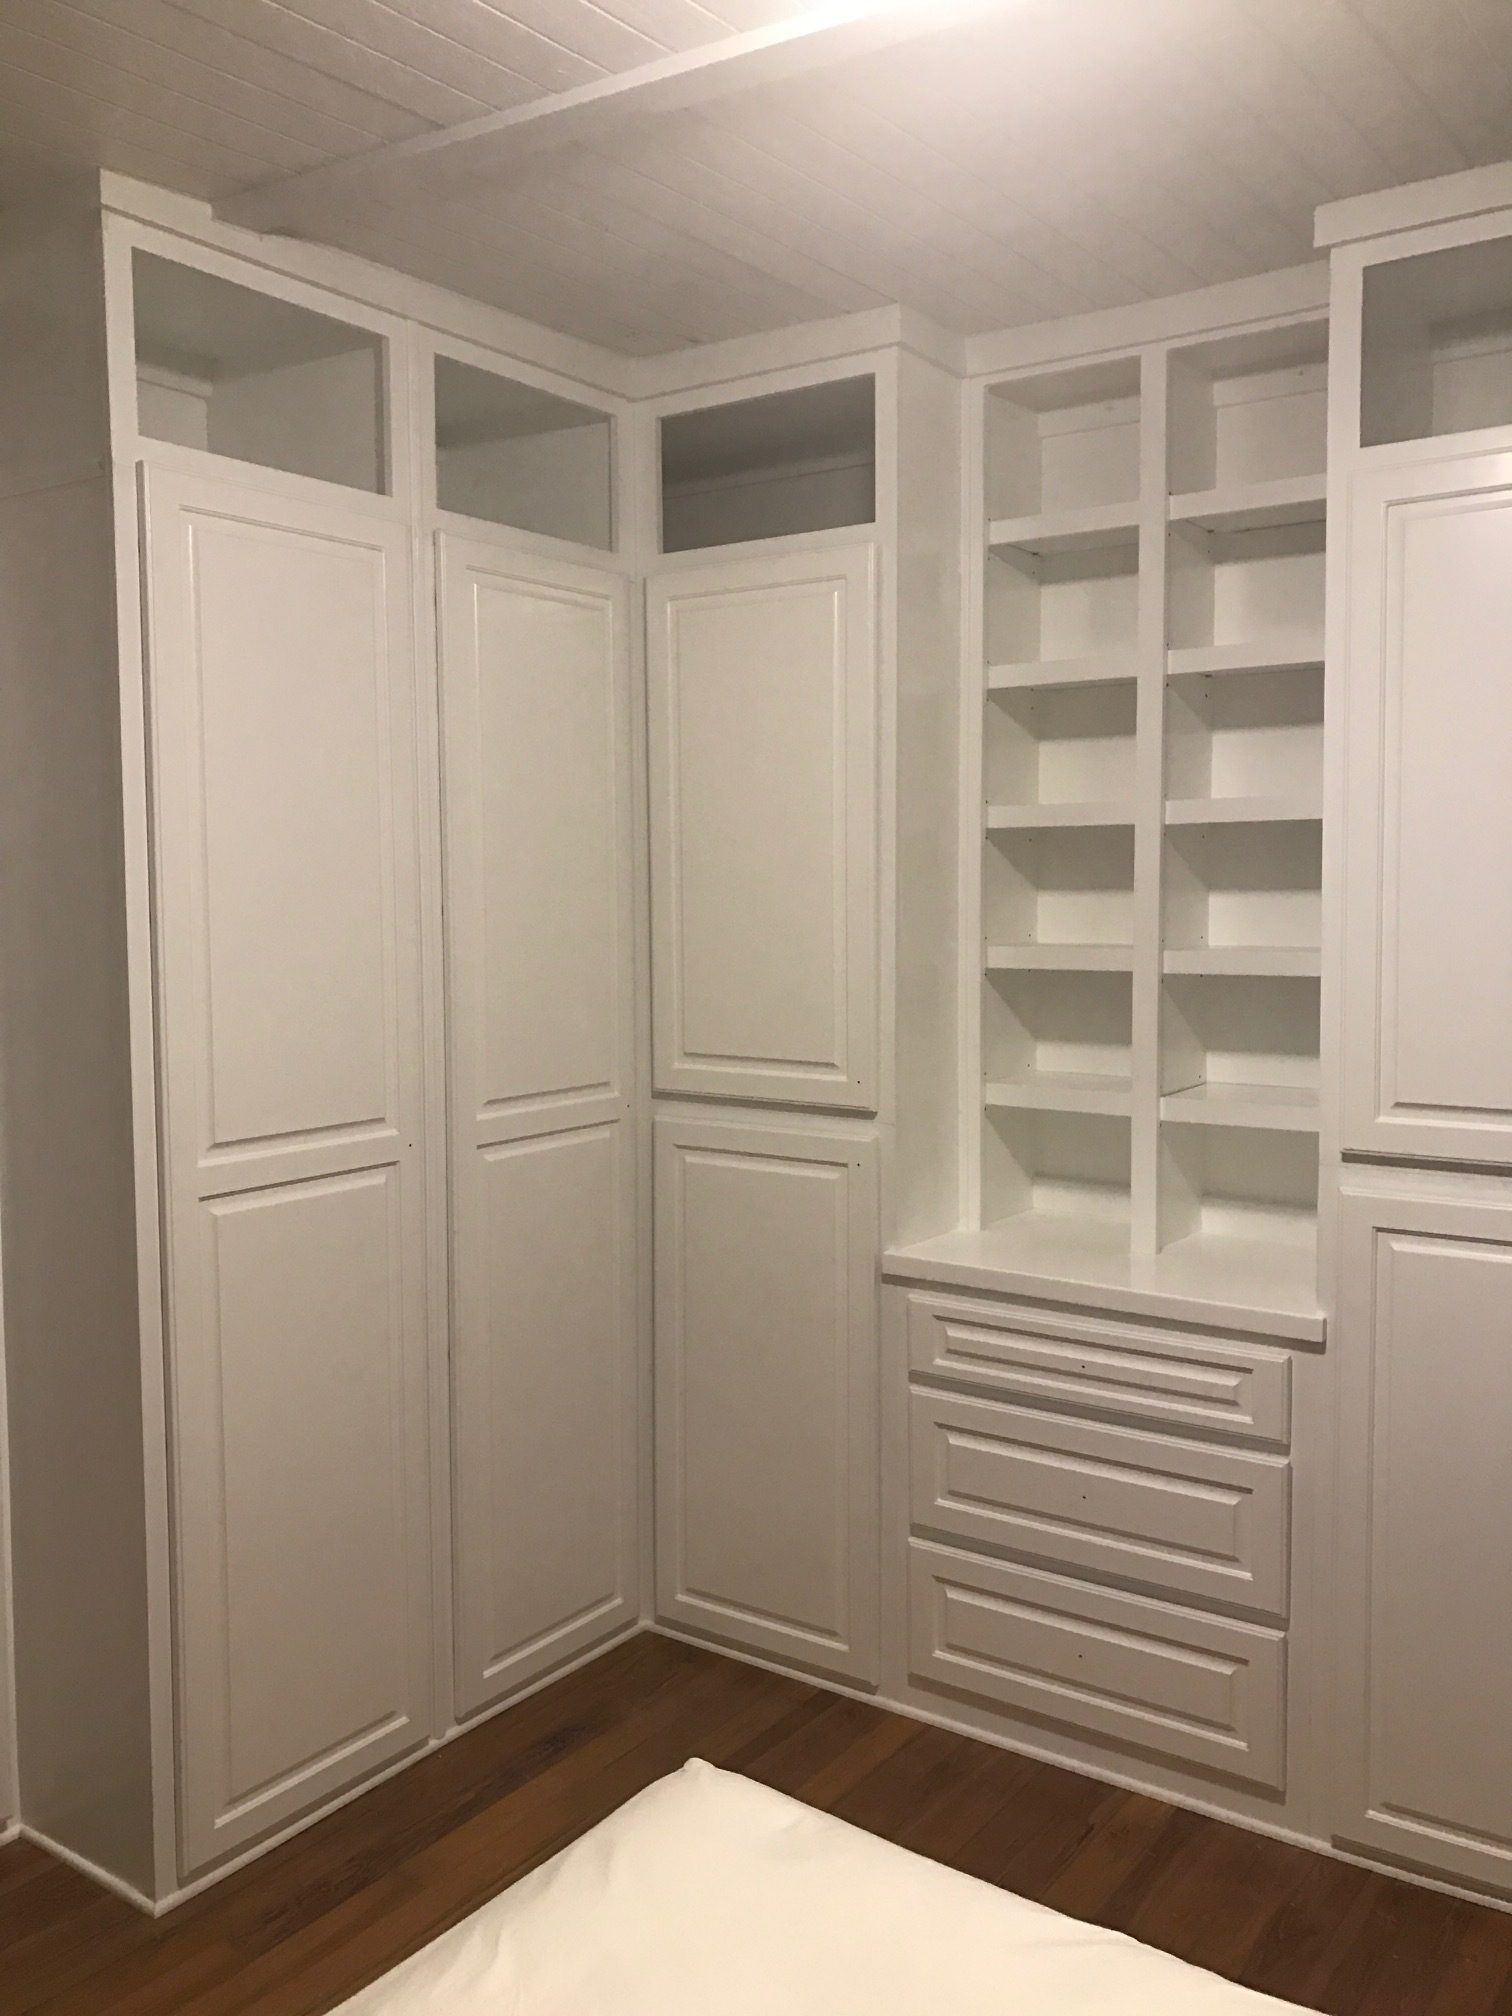 Custom Master Walk-In Closet with Raised Panel Doors, Shoe/Sweater Boxes & Drawers